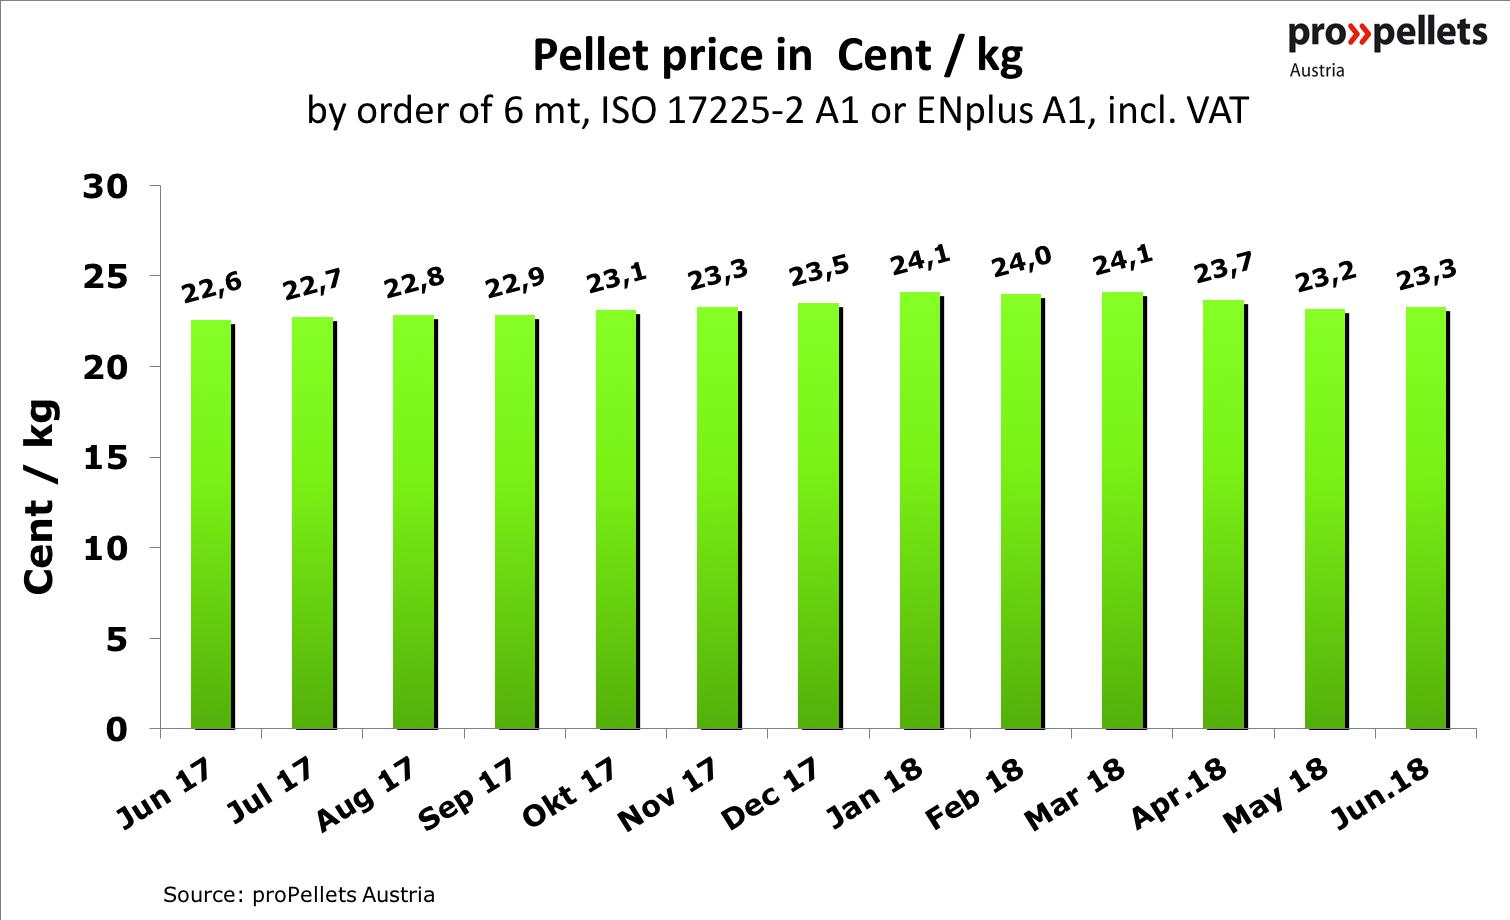 Pellet price in Cent / kg